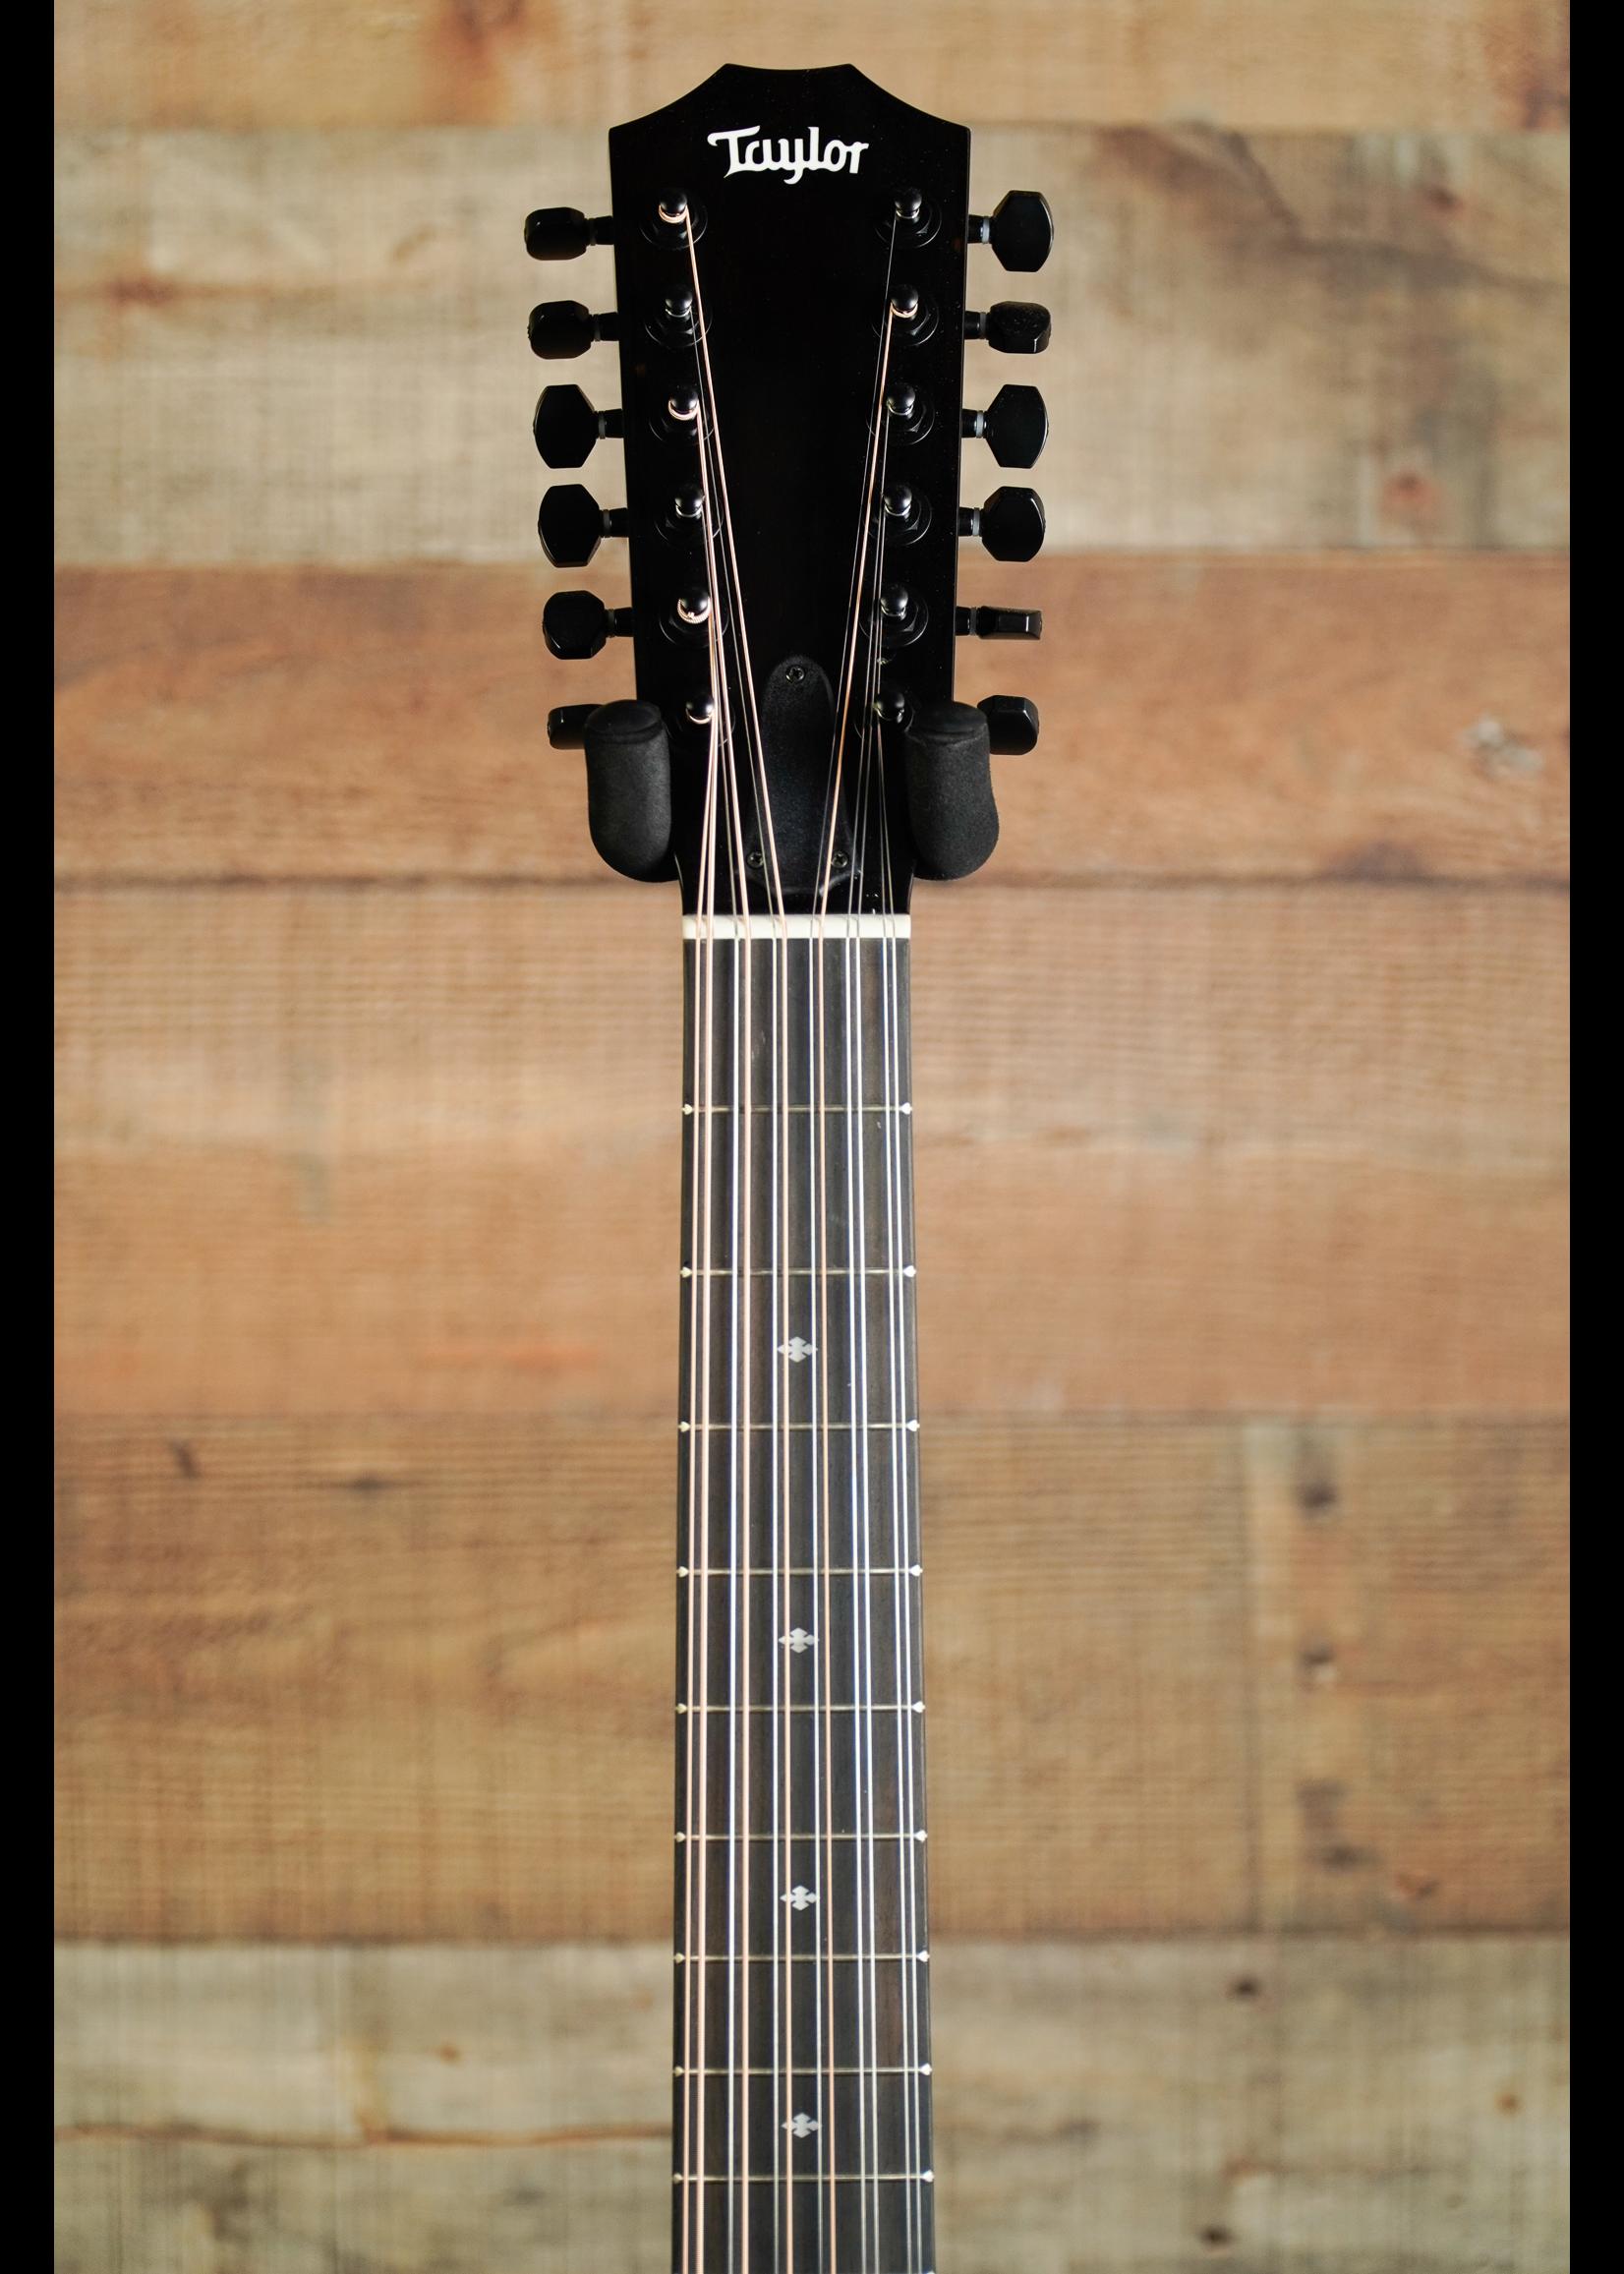 Taylor Taylor  250e BLK DLX 12 String  Black